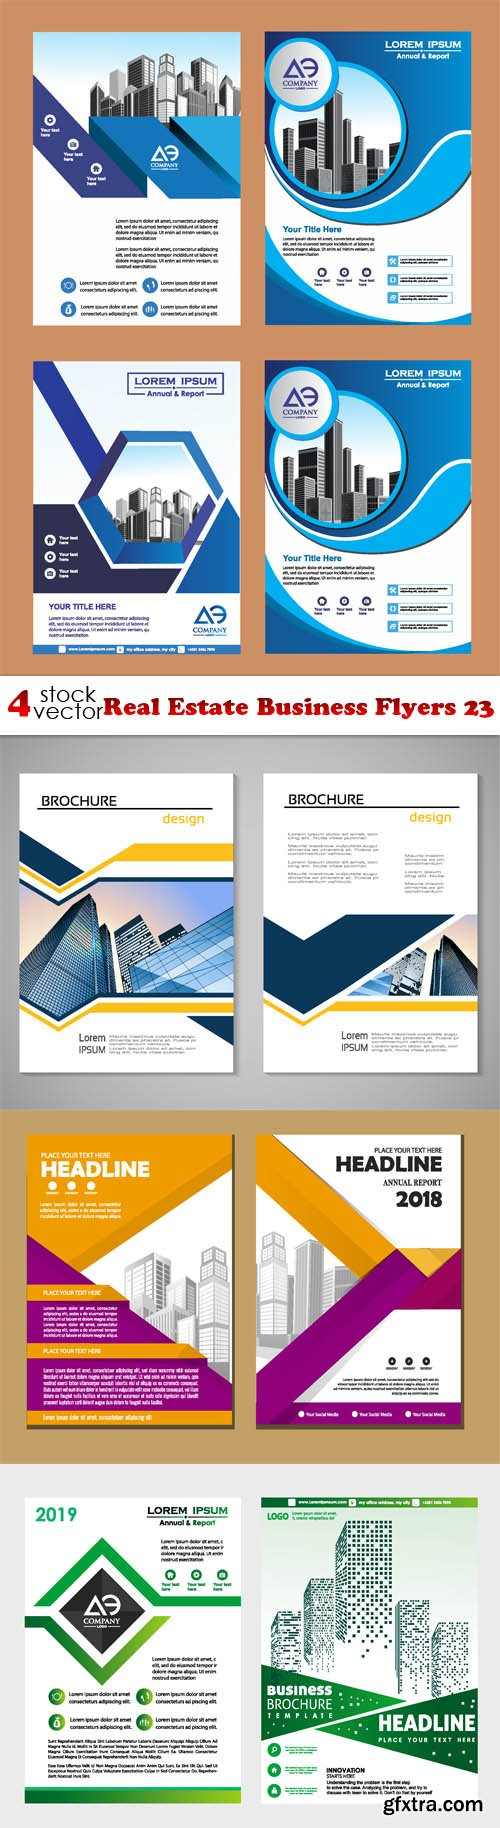 Vectors - Real Estate Business Flyers 23